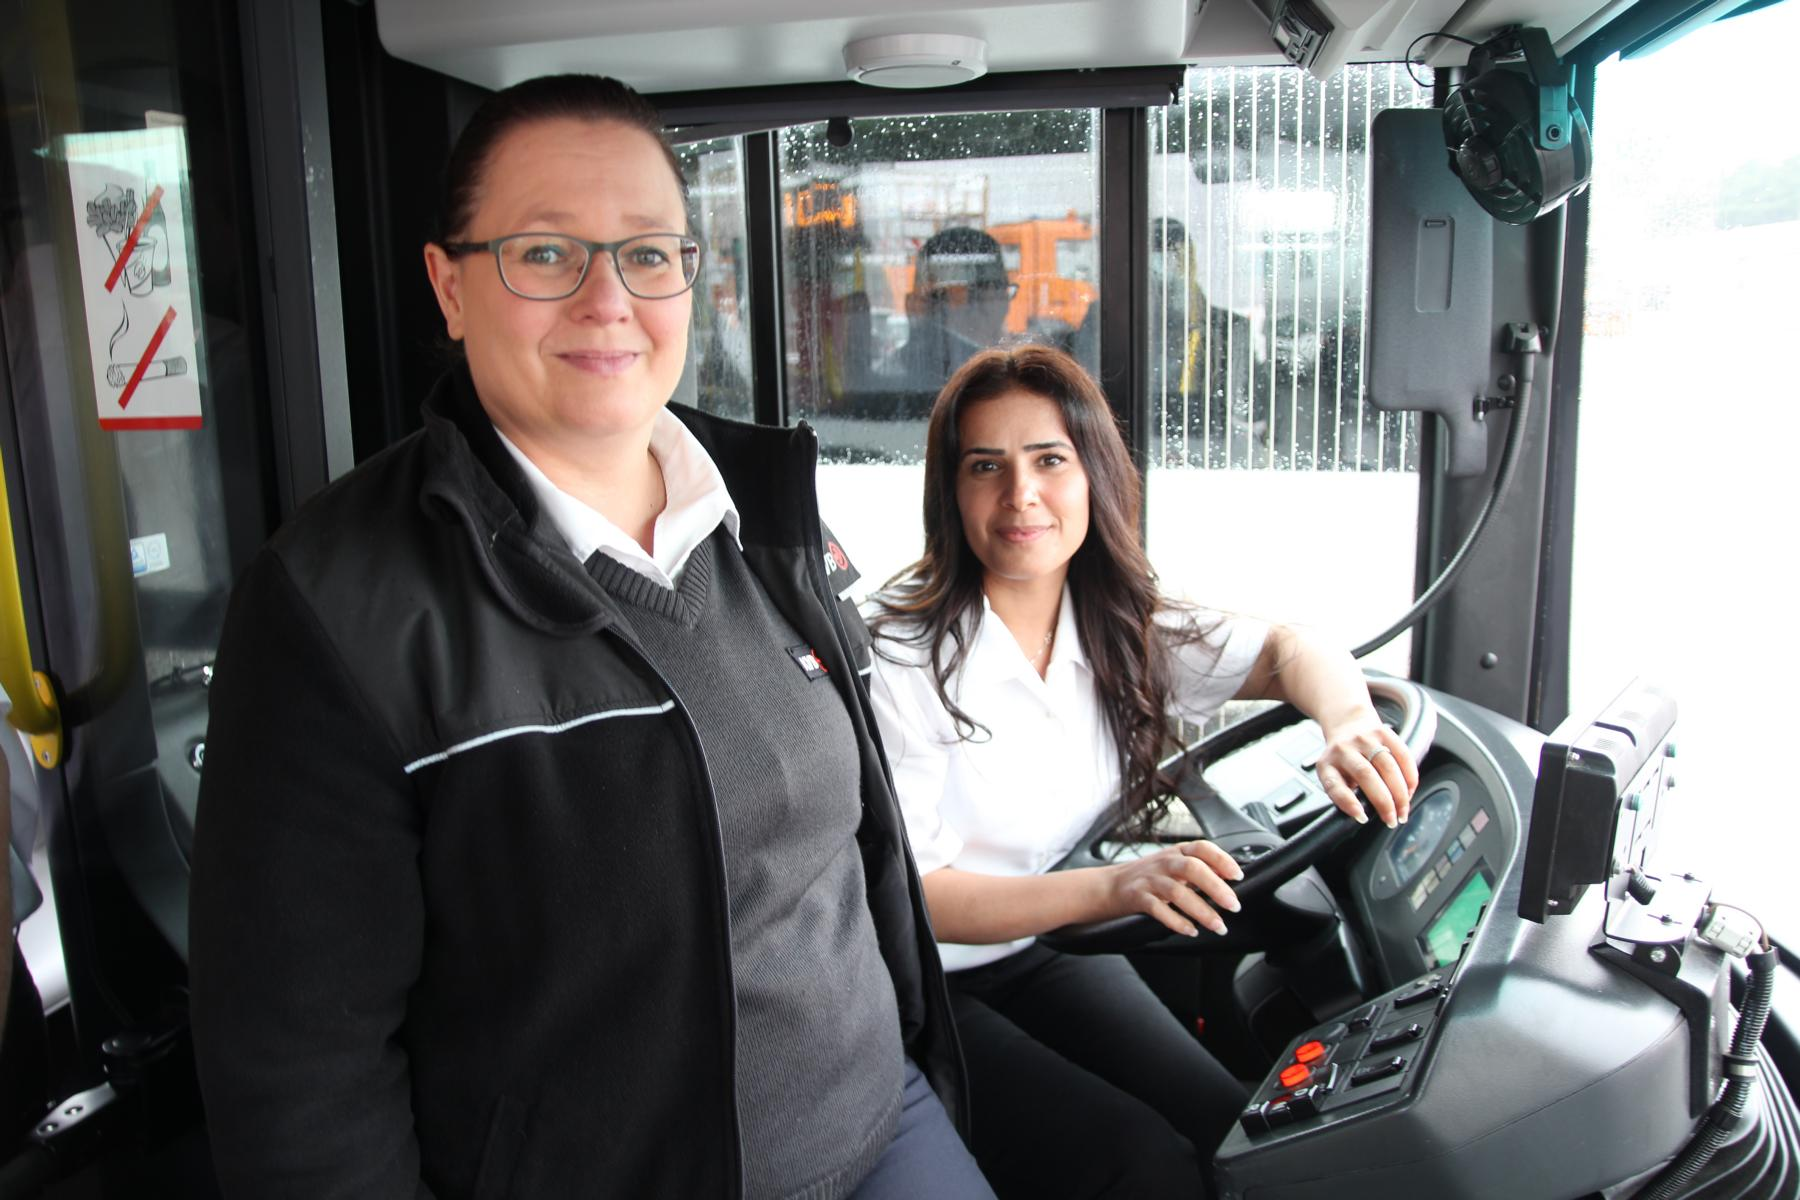 Lehrgangs-Teilnehmerin Tara J. (r.) mit Fahrlehrerin Annette Simon